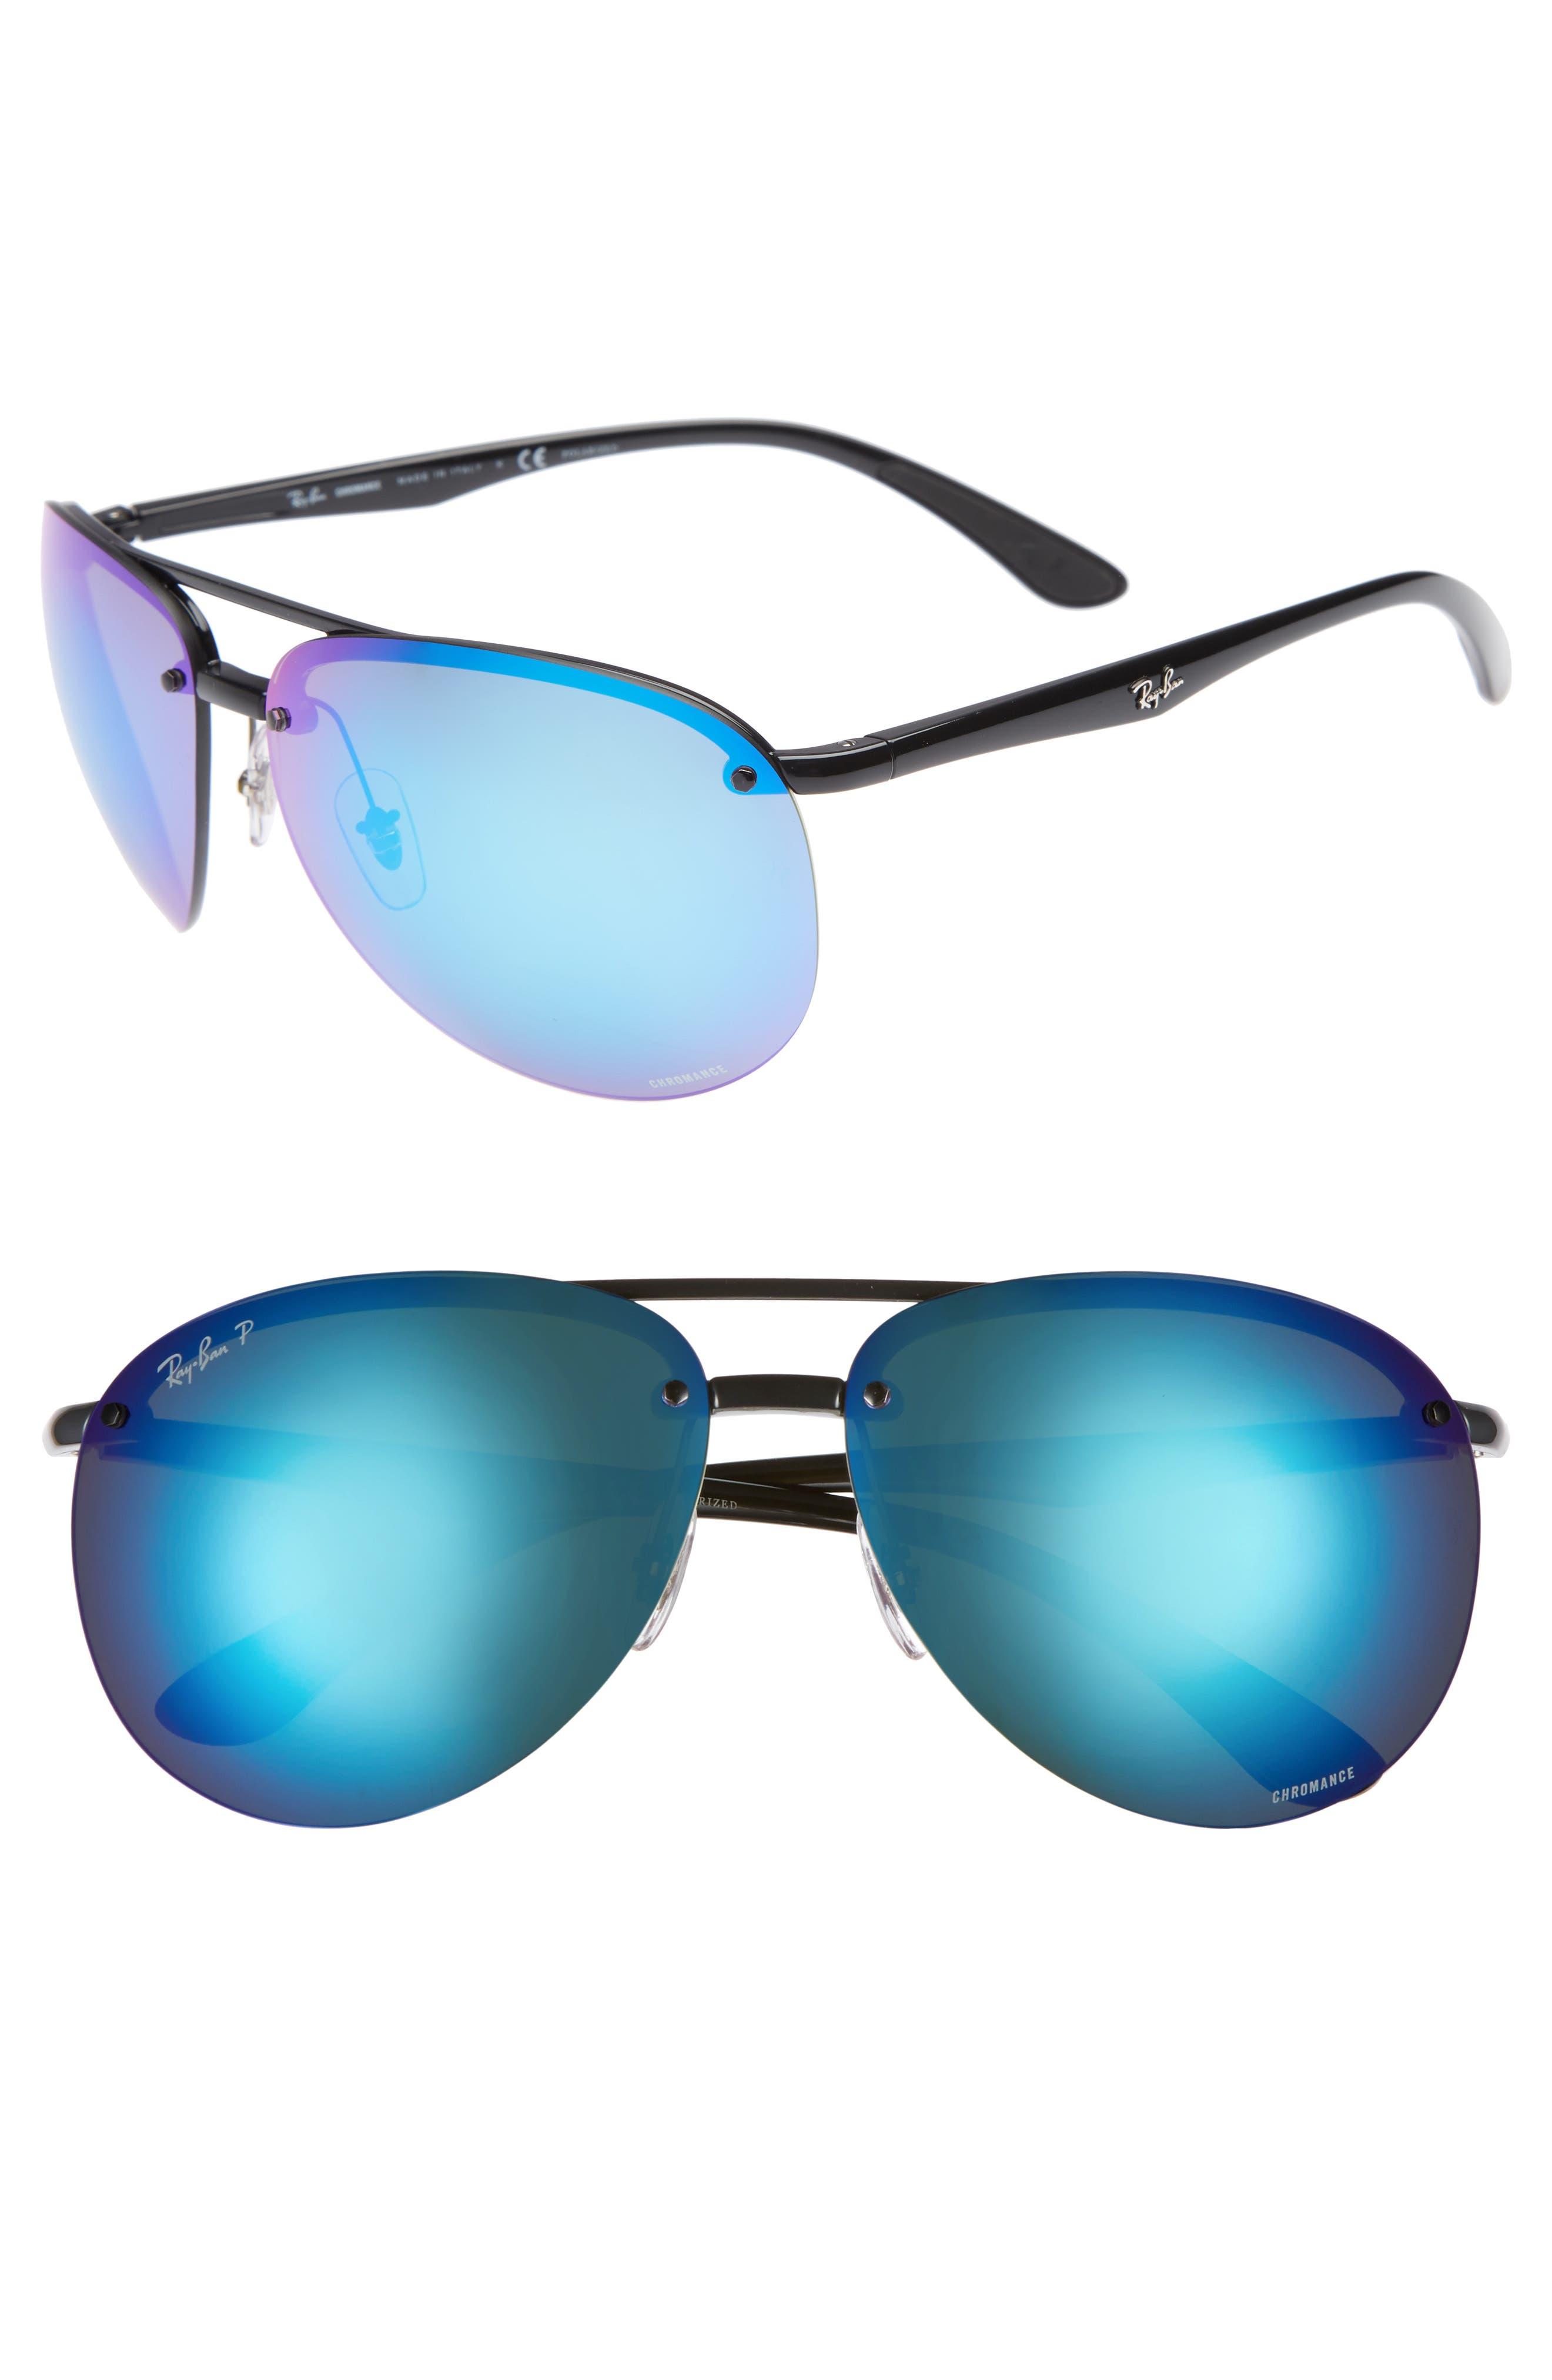 65mm Chromance Polarized Aviator Sunglasses,                         Main,                         color, BLACK